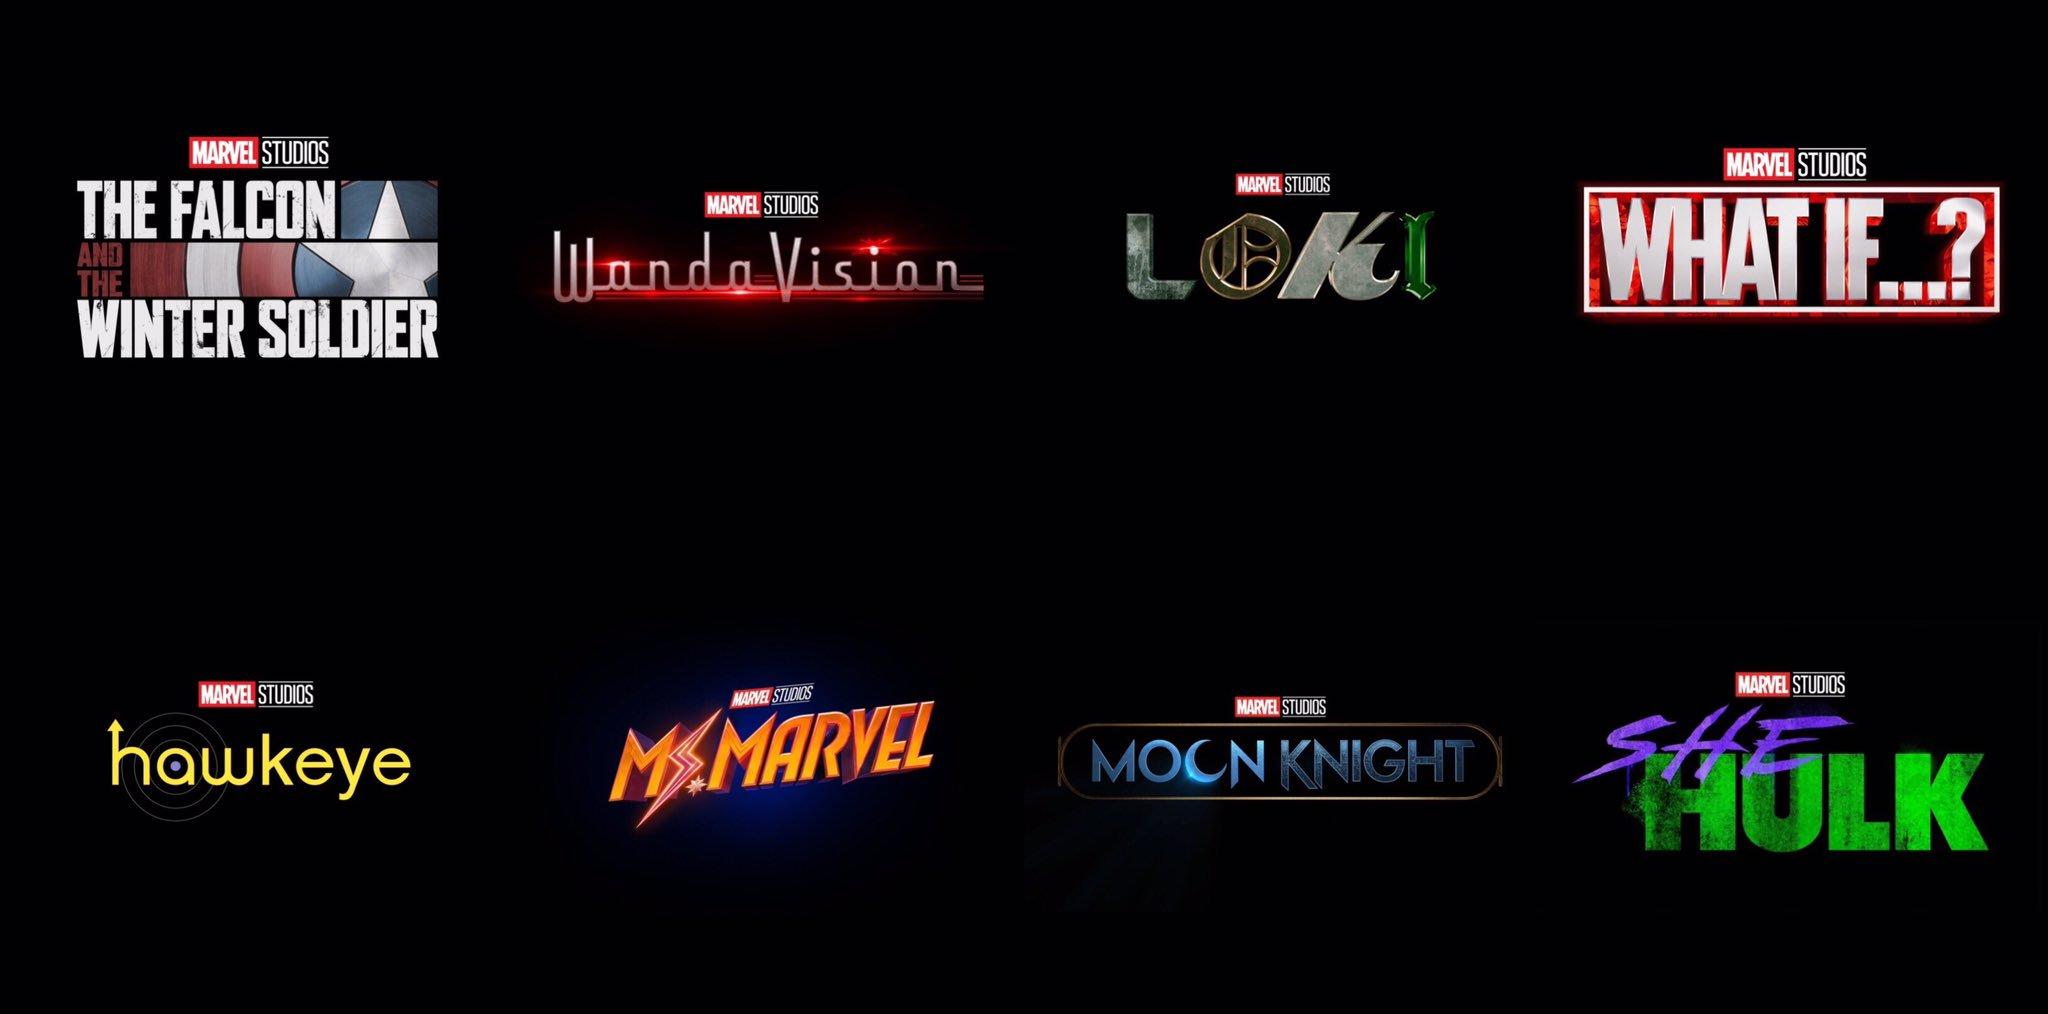 El tópic del Universo Cinematográfico Marvel  - Página 8 ECsTgy0WwAEQ-XN?format=jpg&name=4096x4096